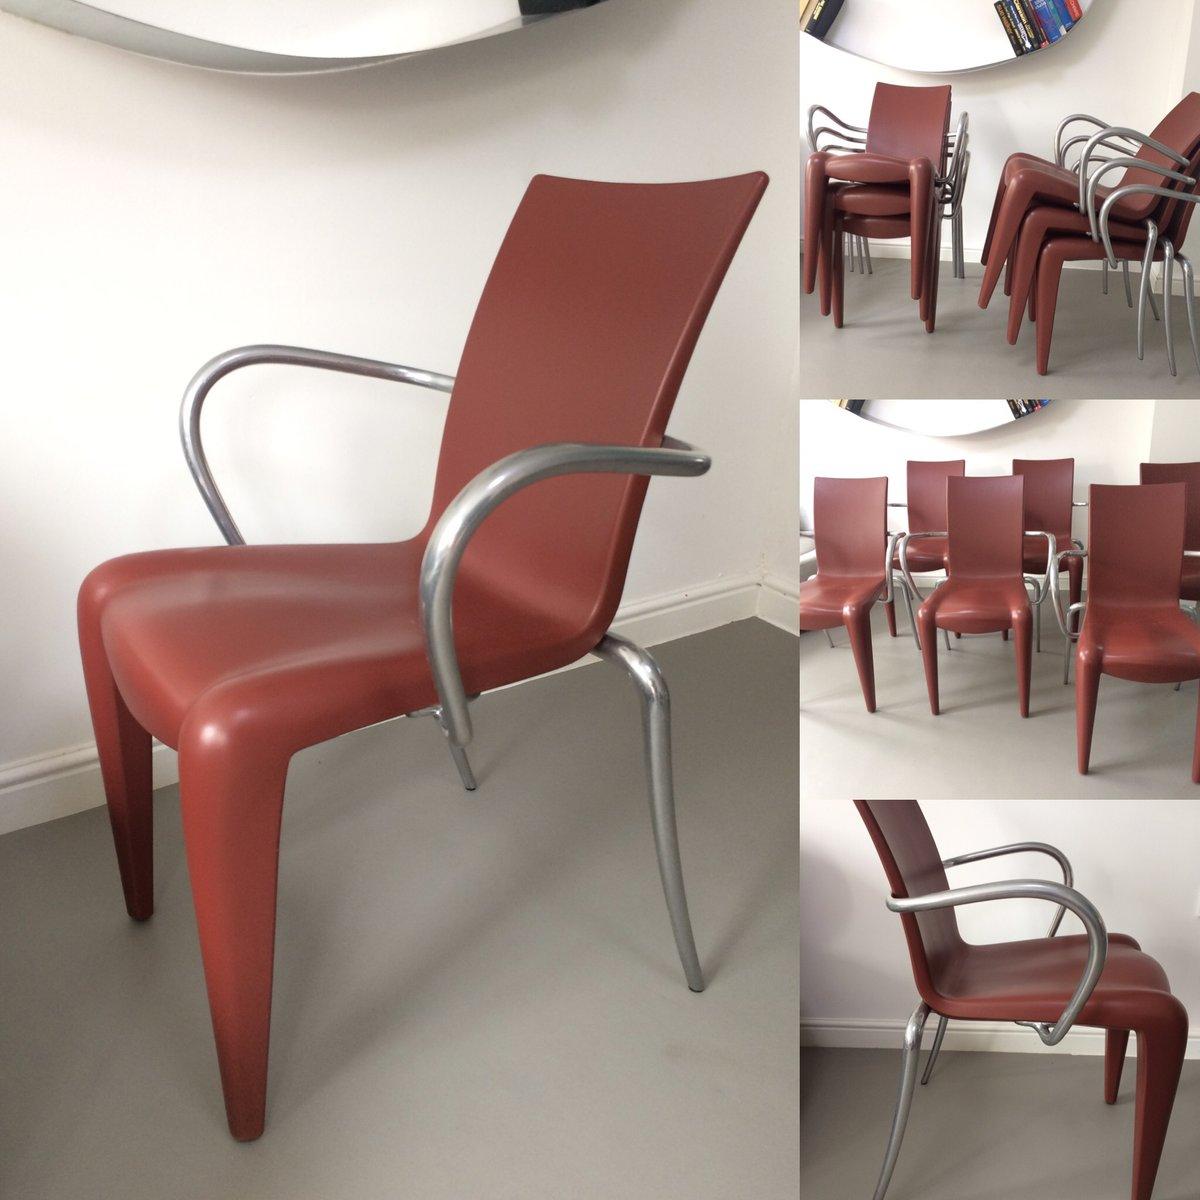 louis 20 st hle von philippe starck f r vitra 1990er 6er set bei pamono kaufen. Black Bedroom Furniture Sets. Home Design Ideas